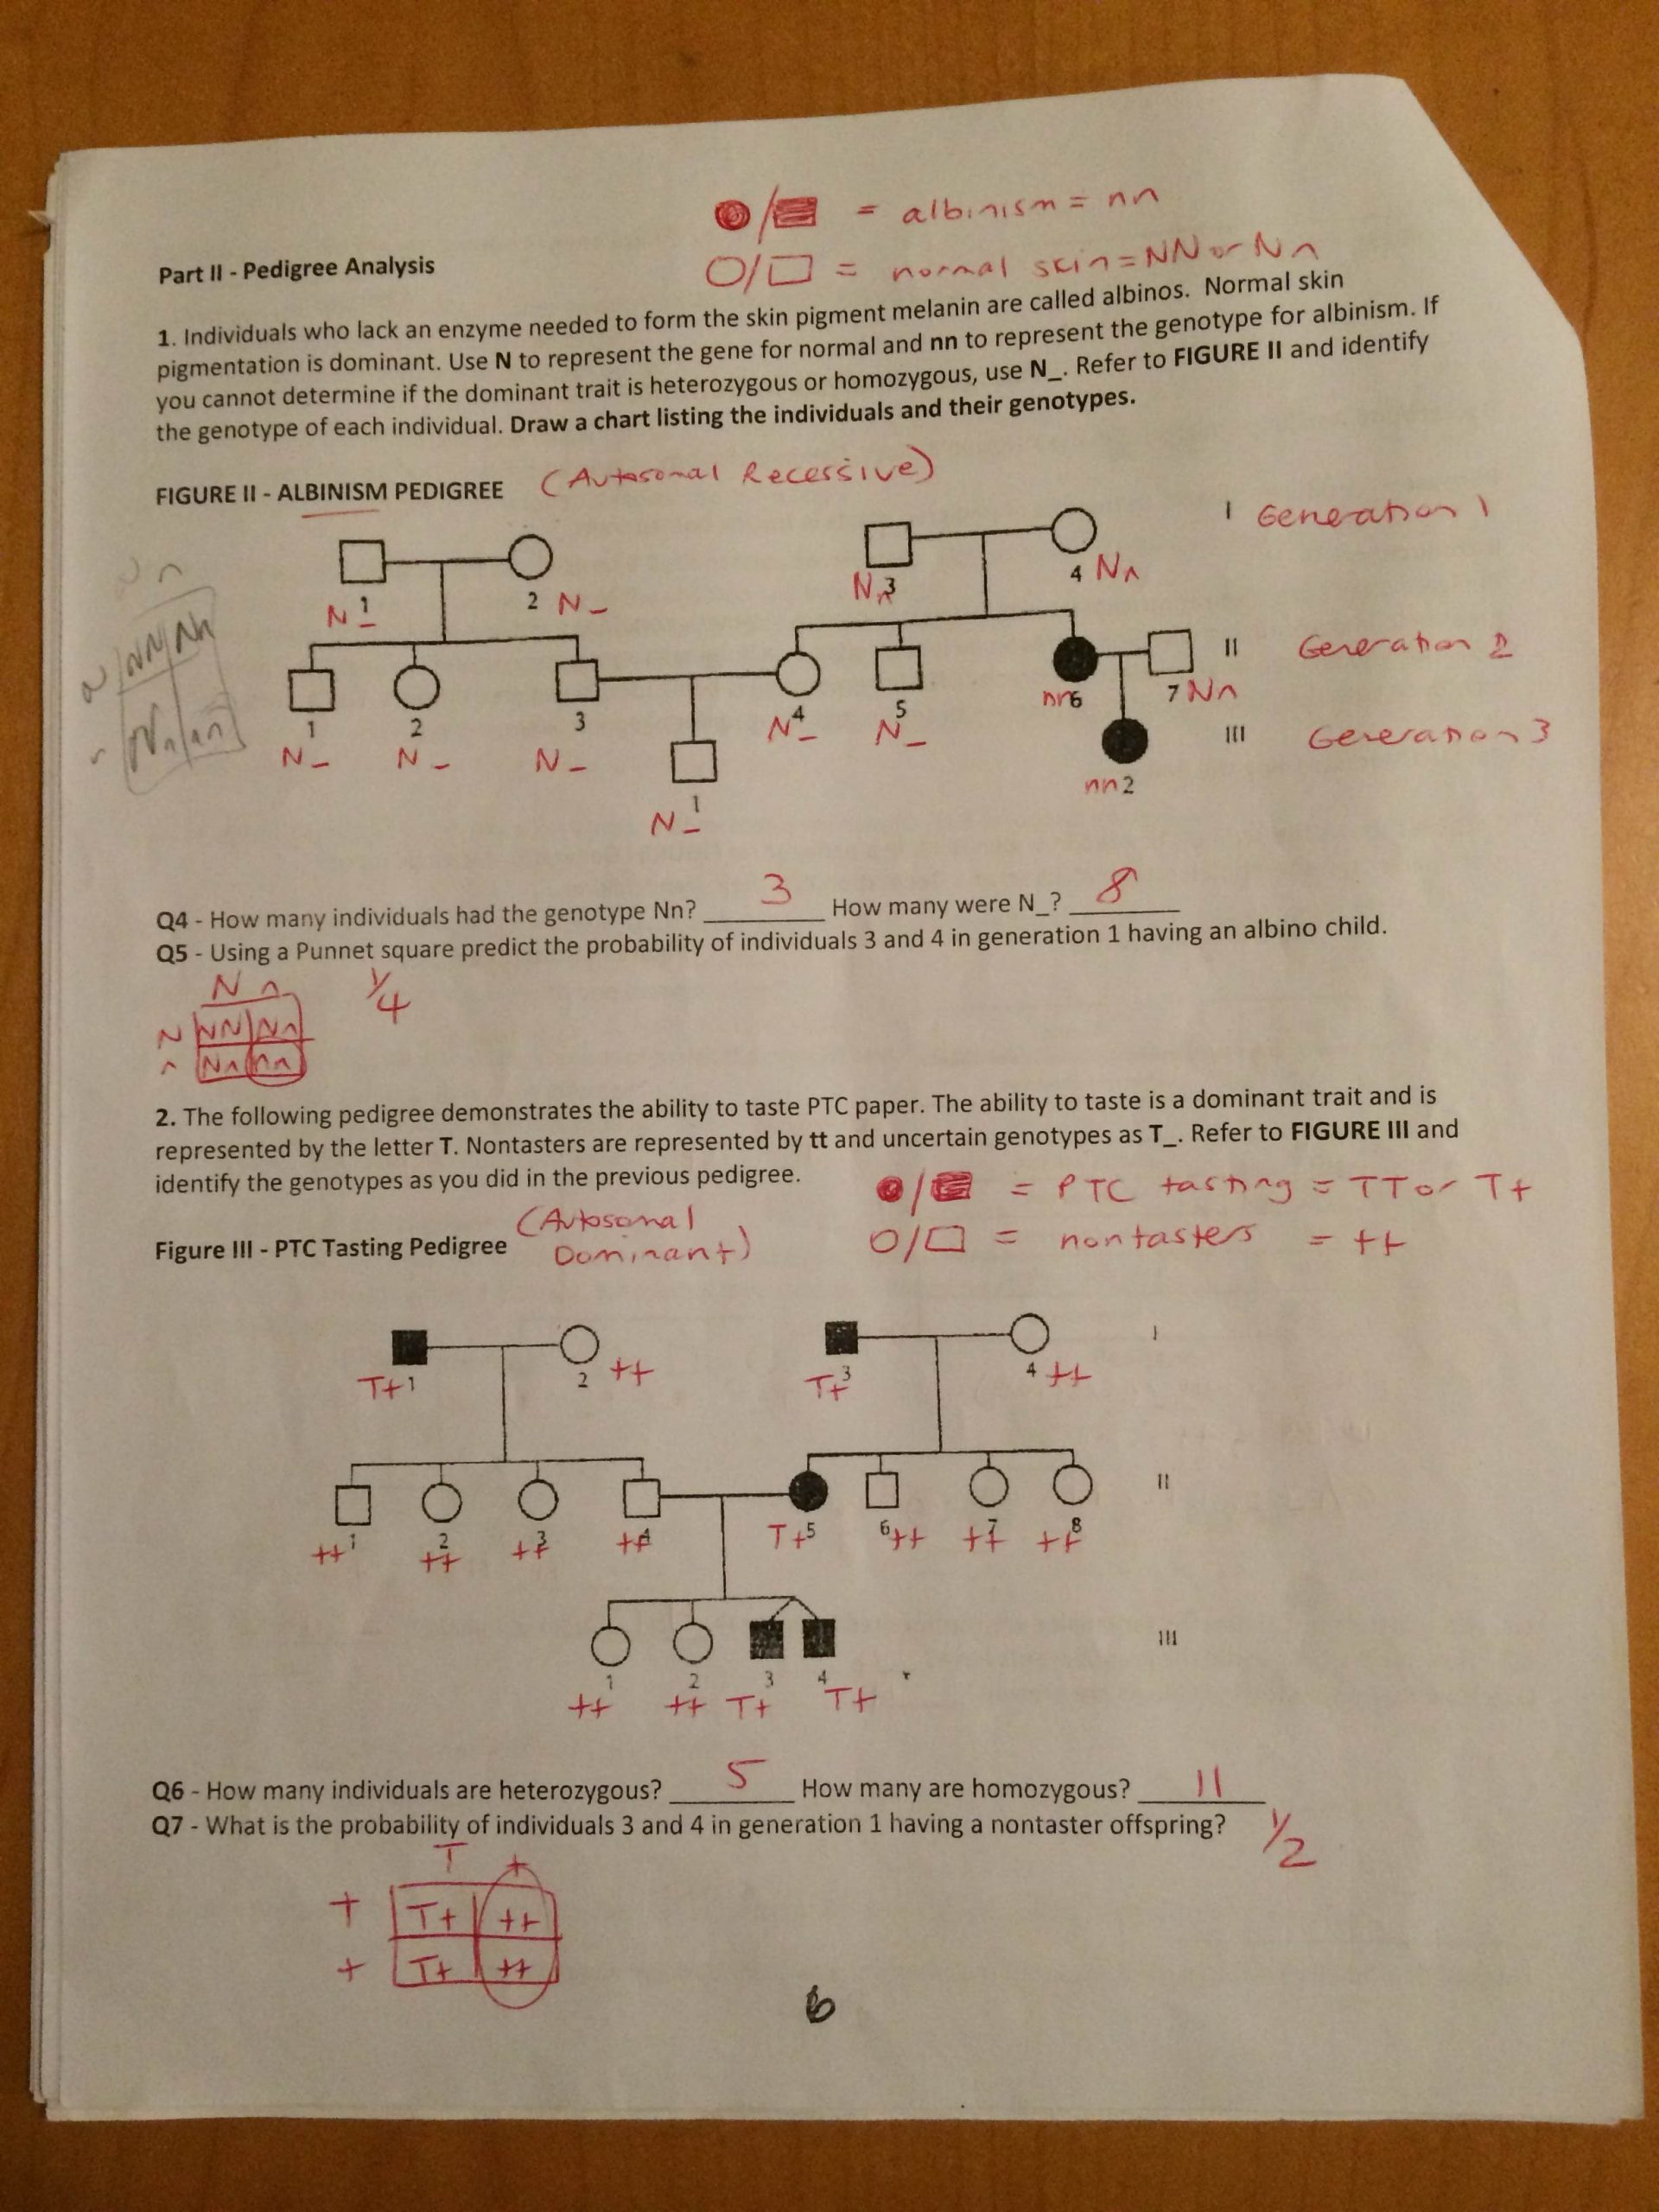 30 Genetics Pedigree Worksheet Answers | Education Template